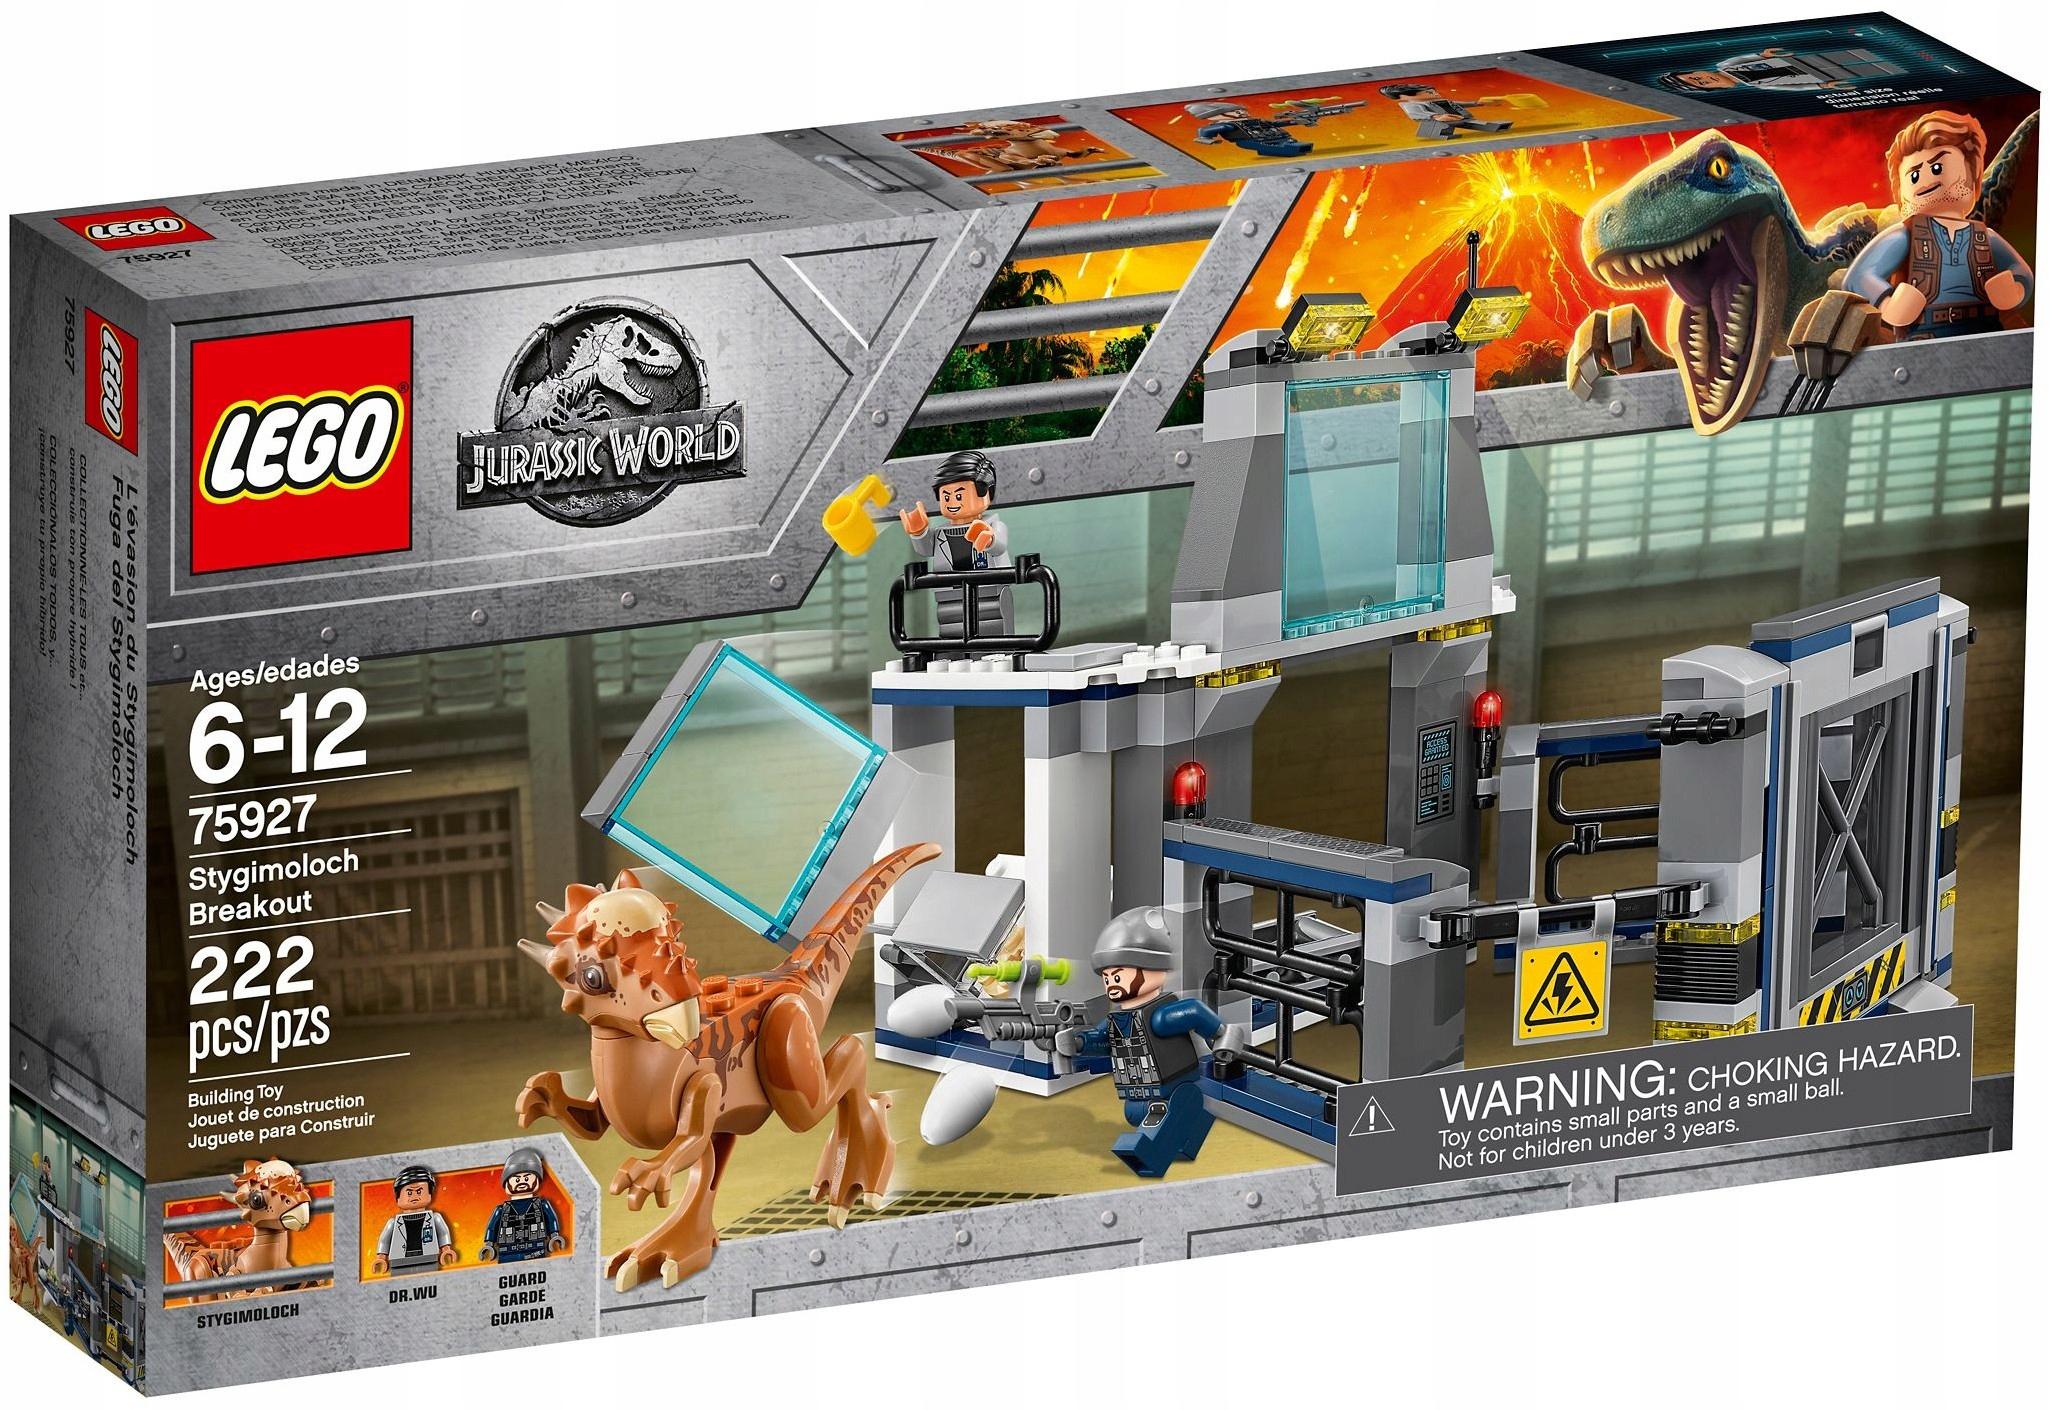 LEGO Jurrasic World Ucieczka z laboratorium 75927